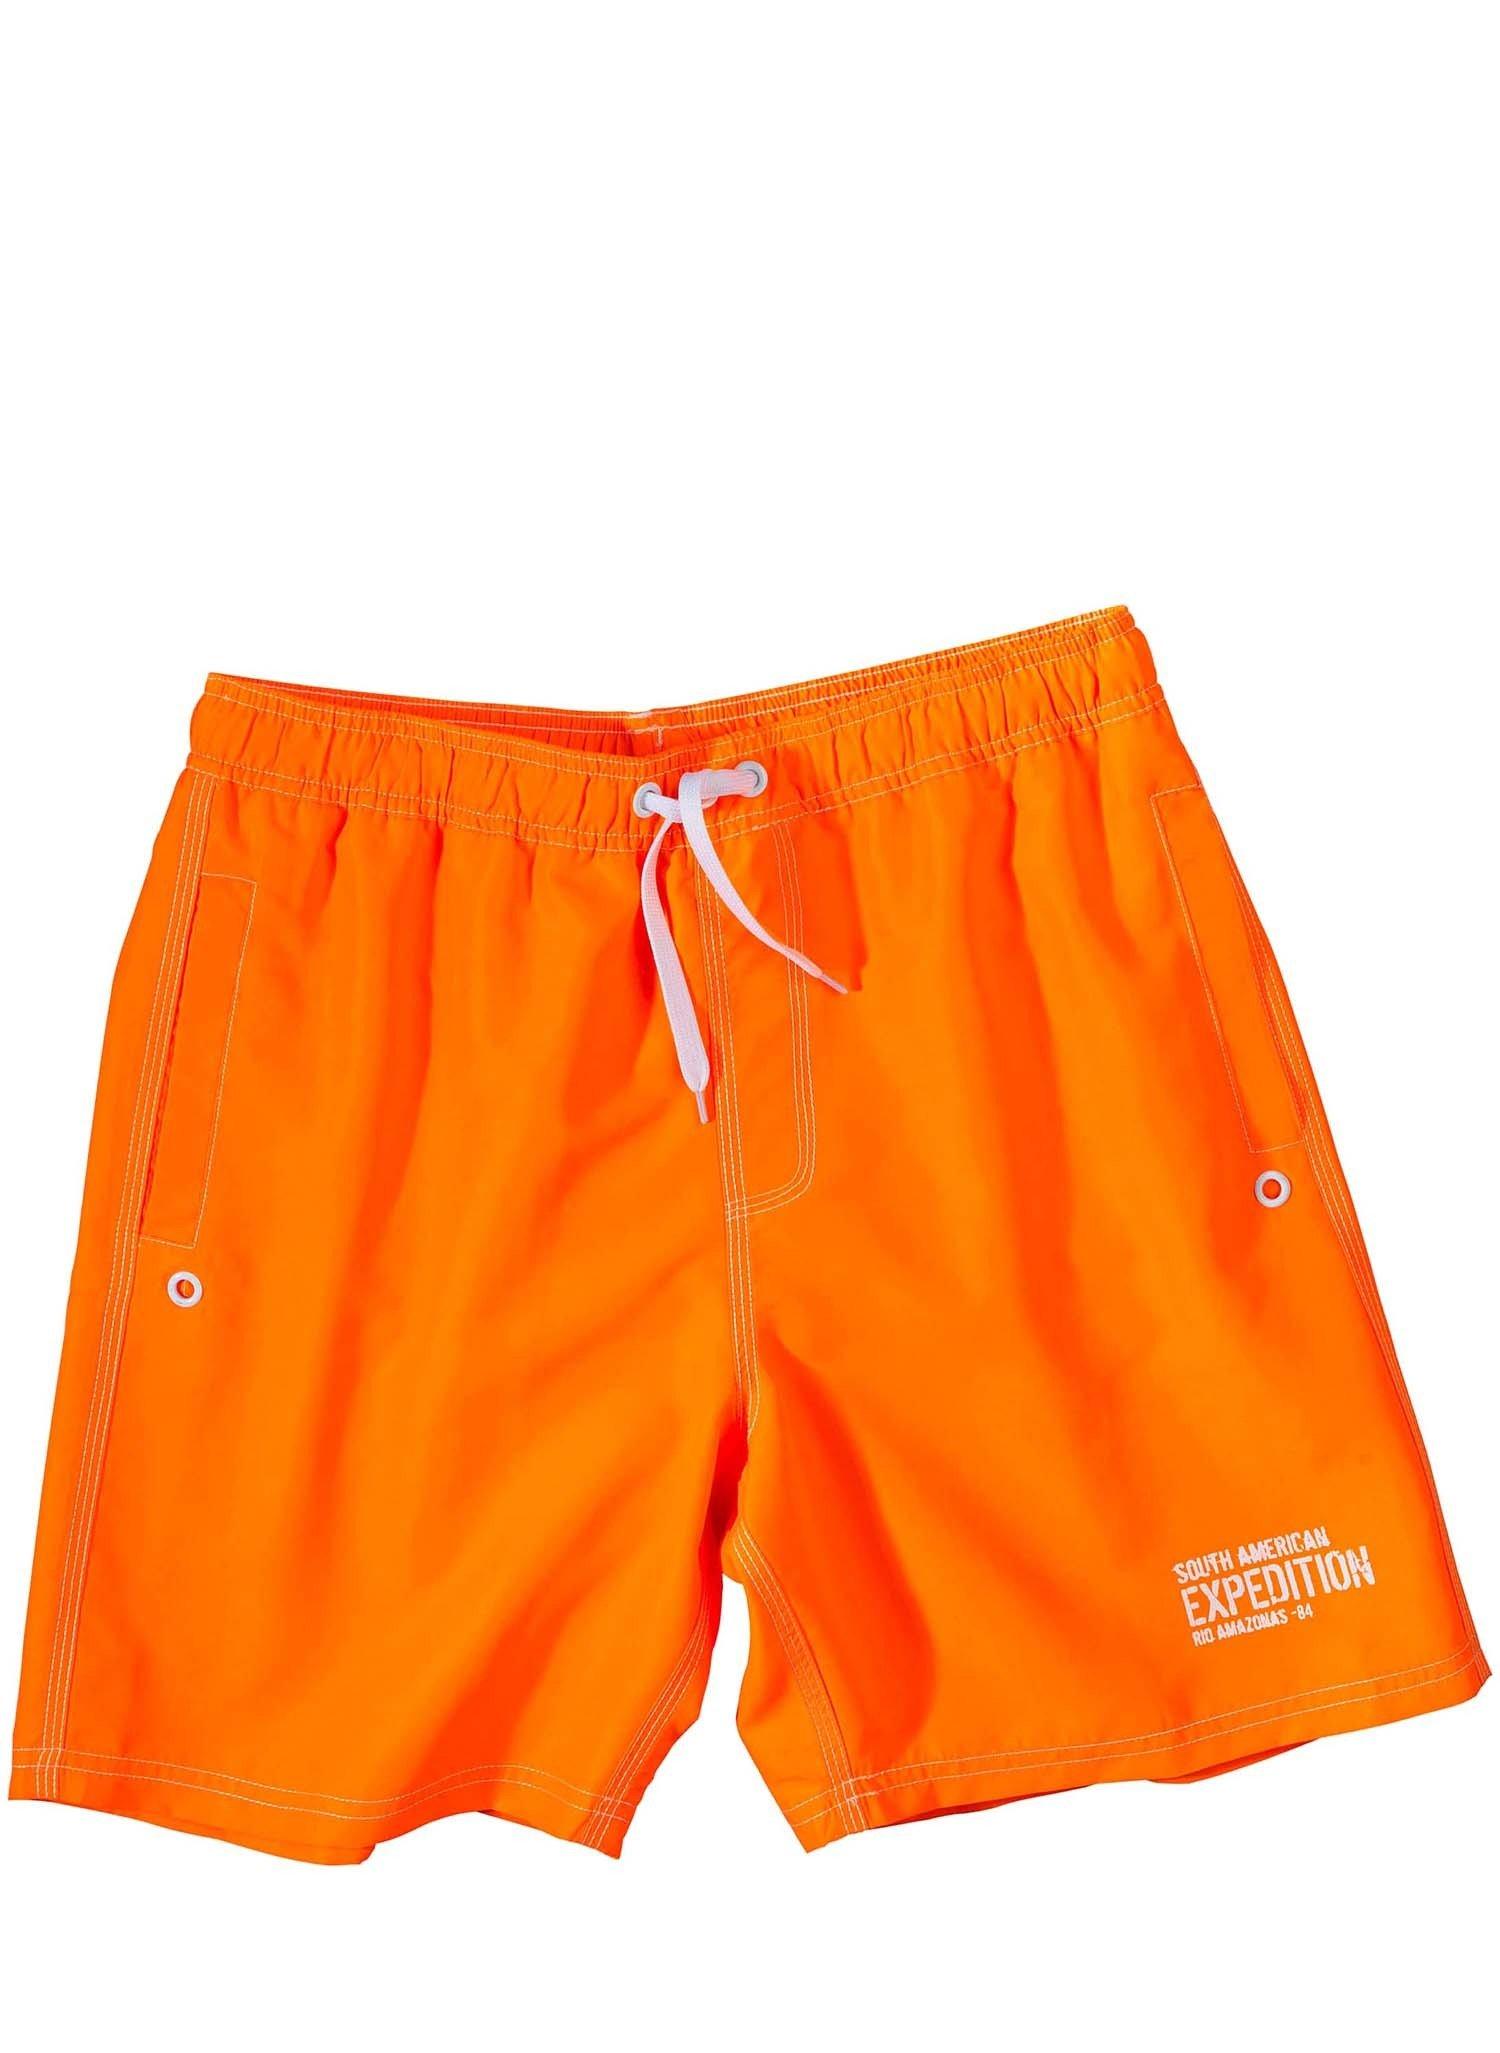 H-Bade-Shorts,NEON orange L 022 - 3 - Ronja.ch